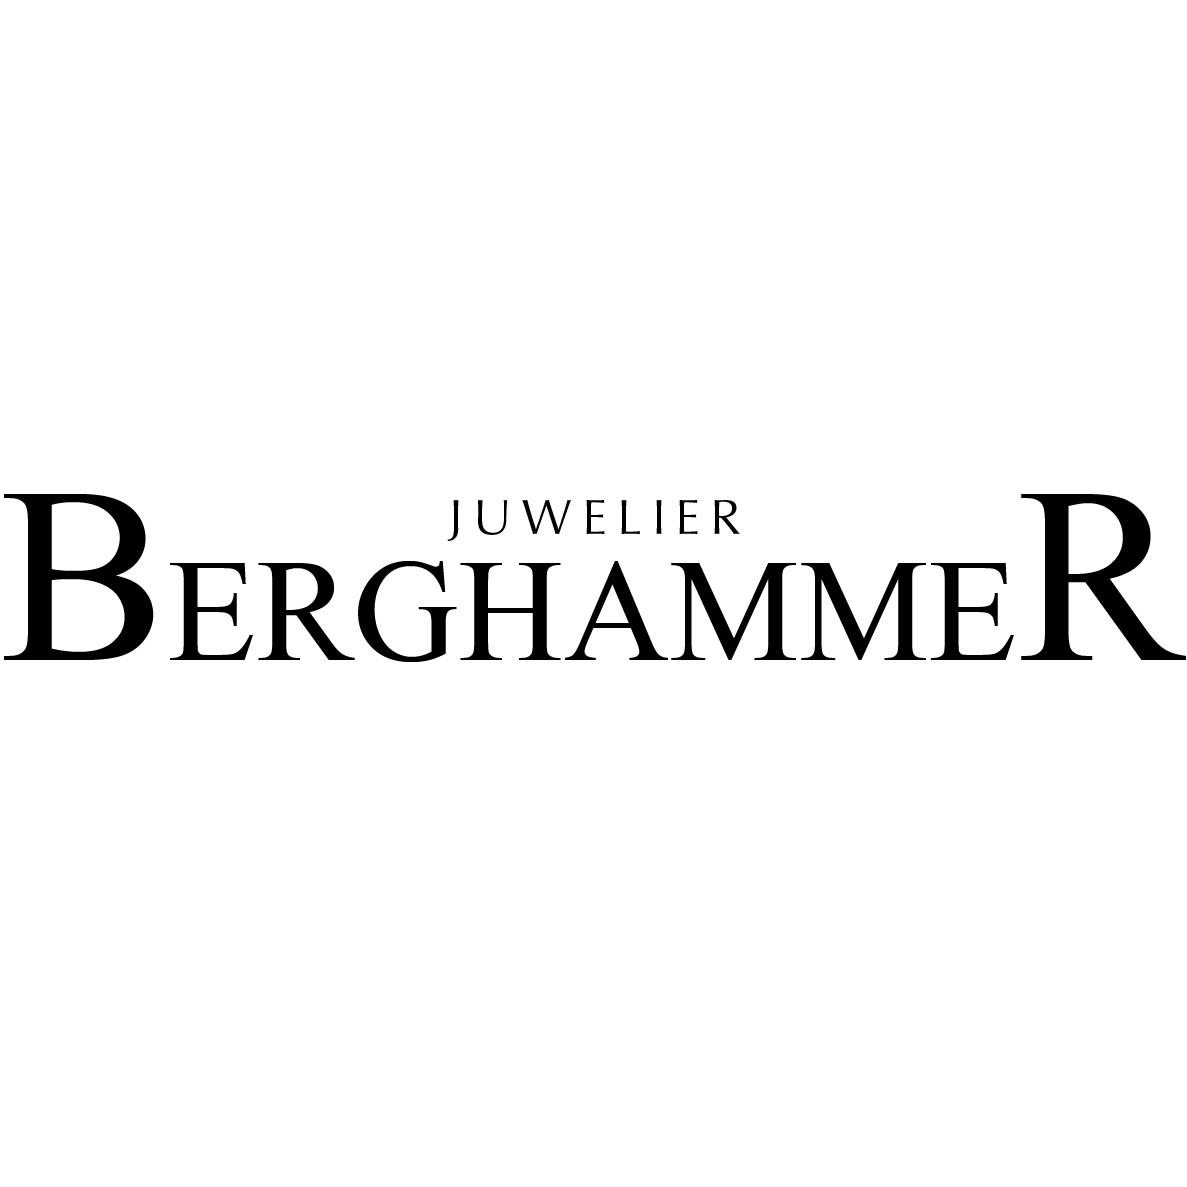 Juwelier Berghammer